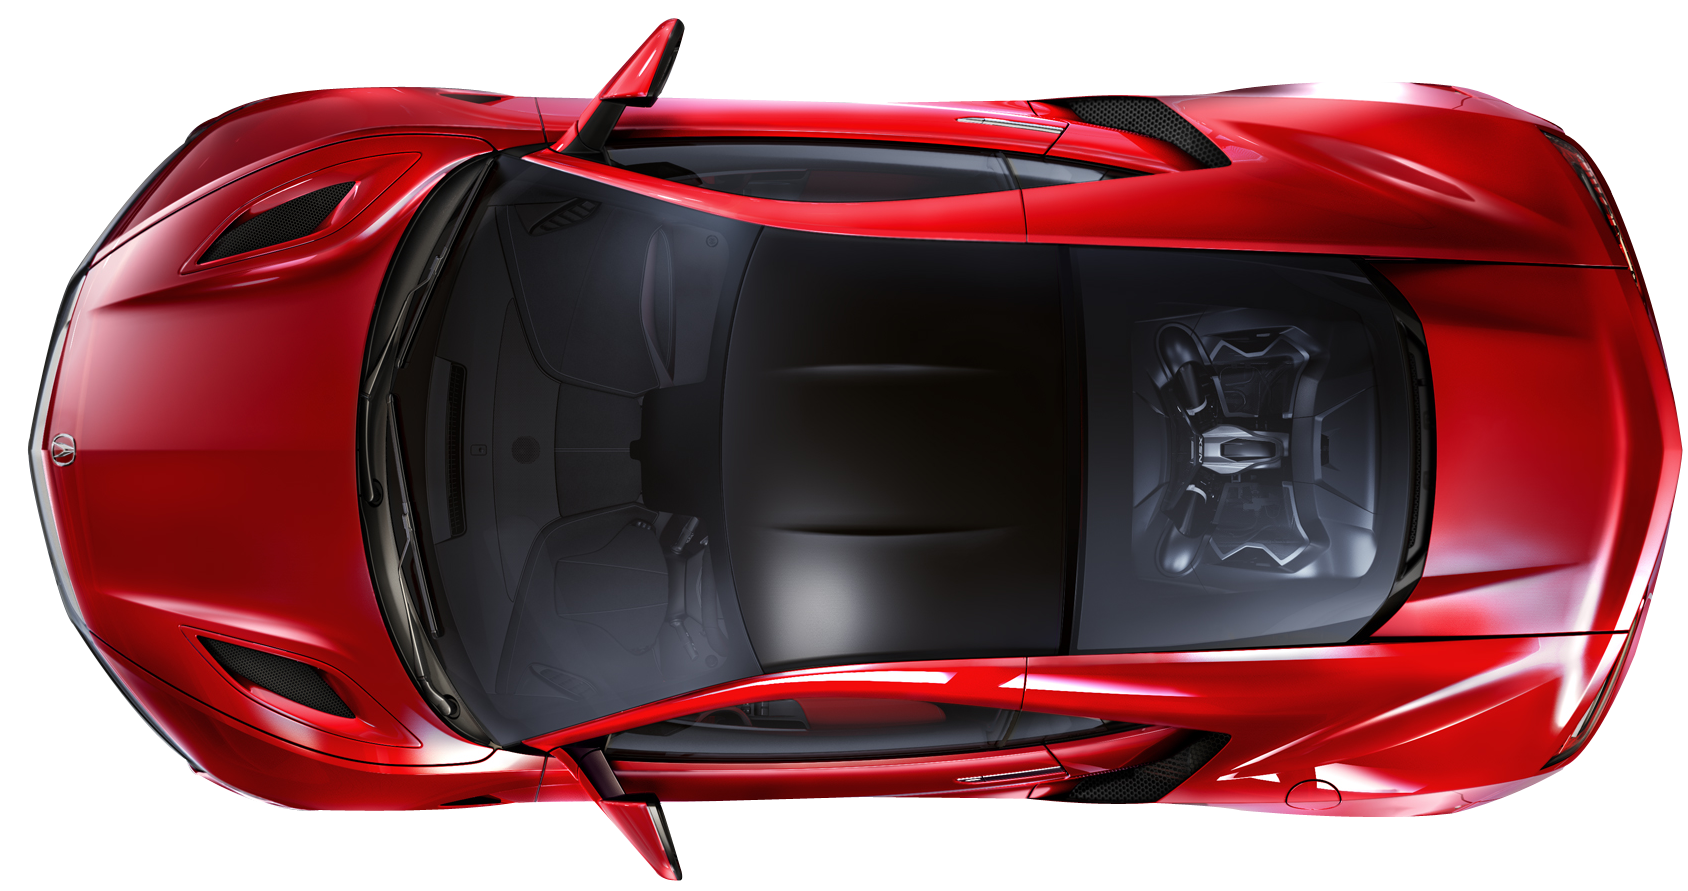 Car png image exterrior. Clipart door top view